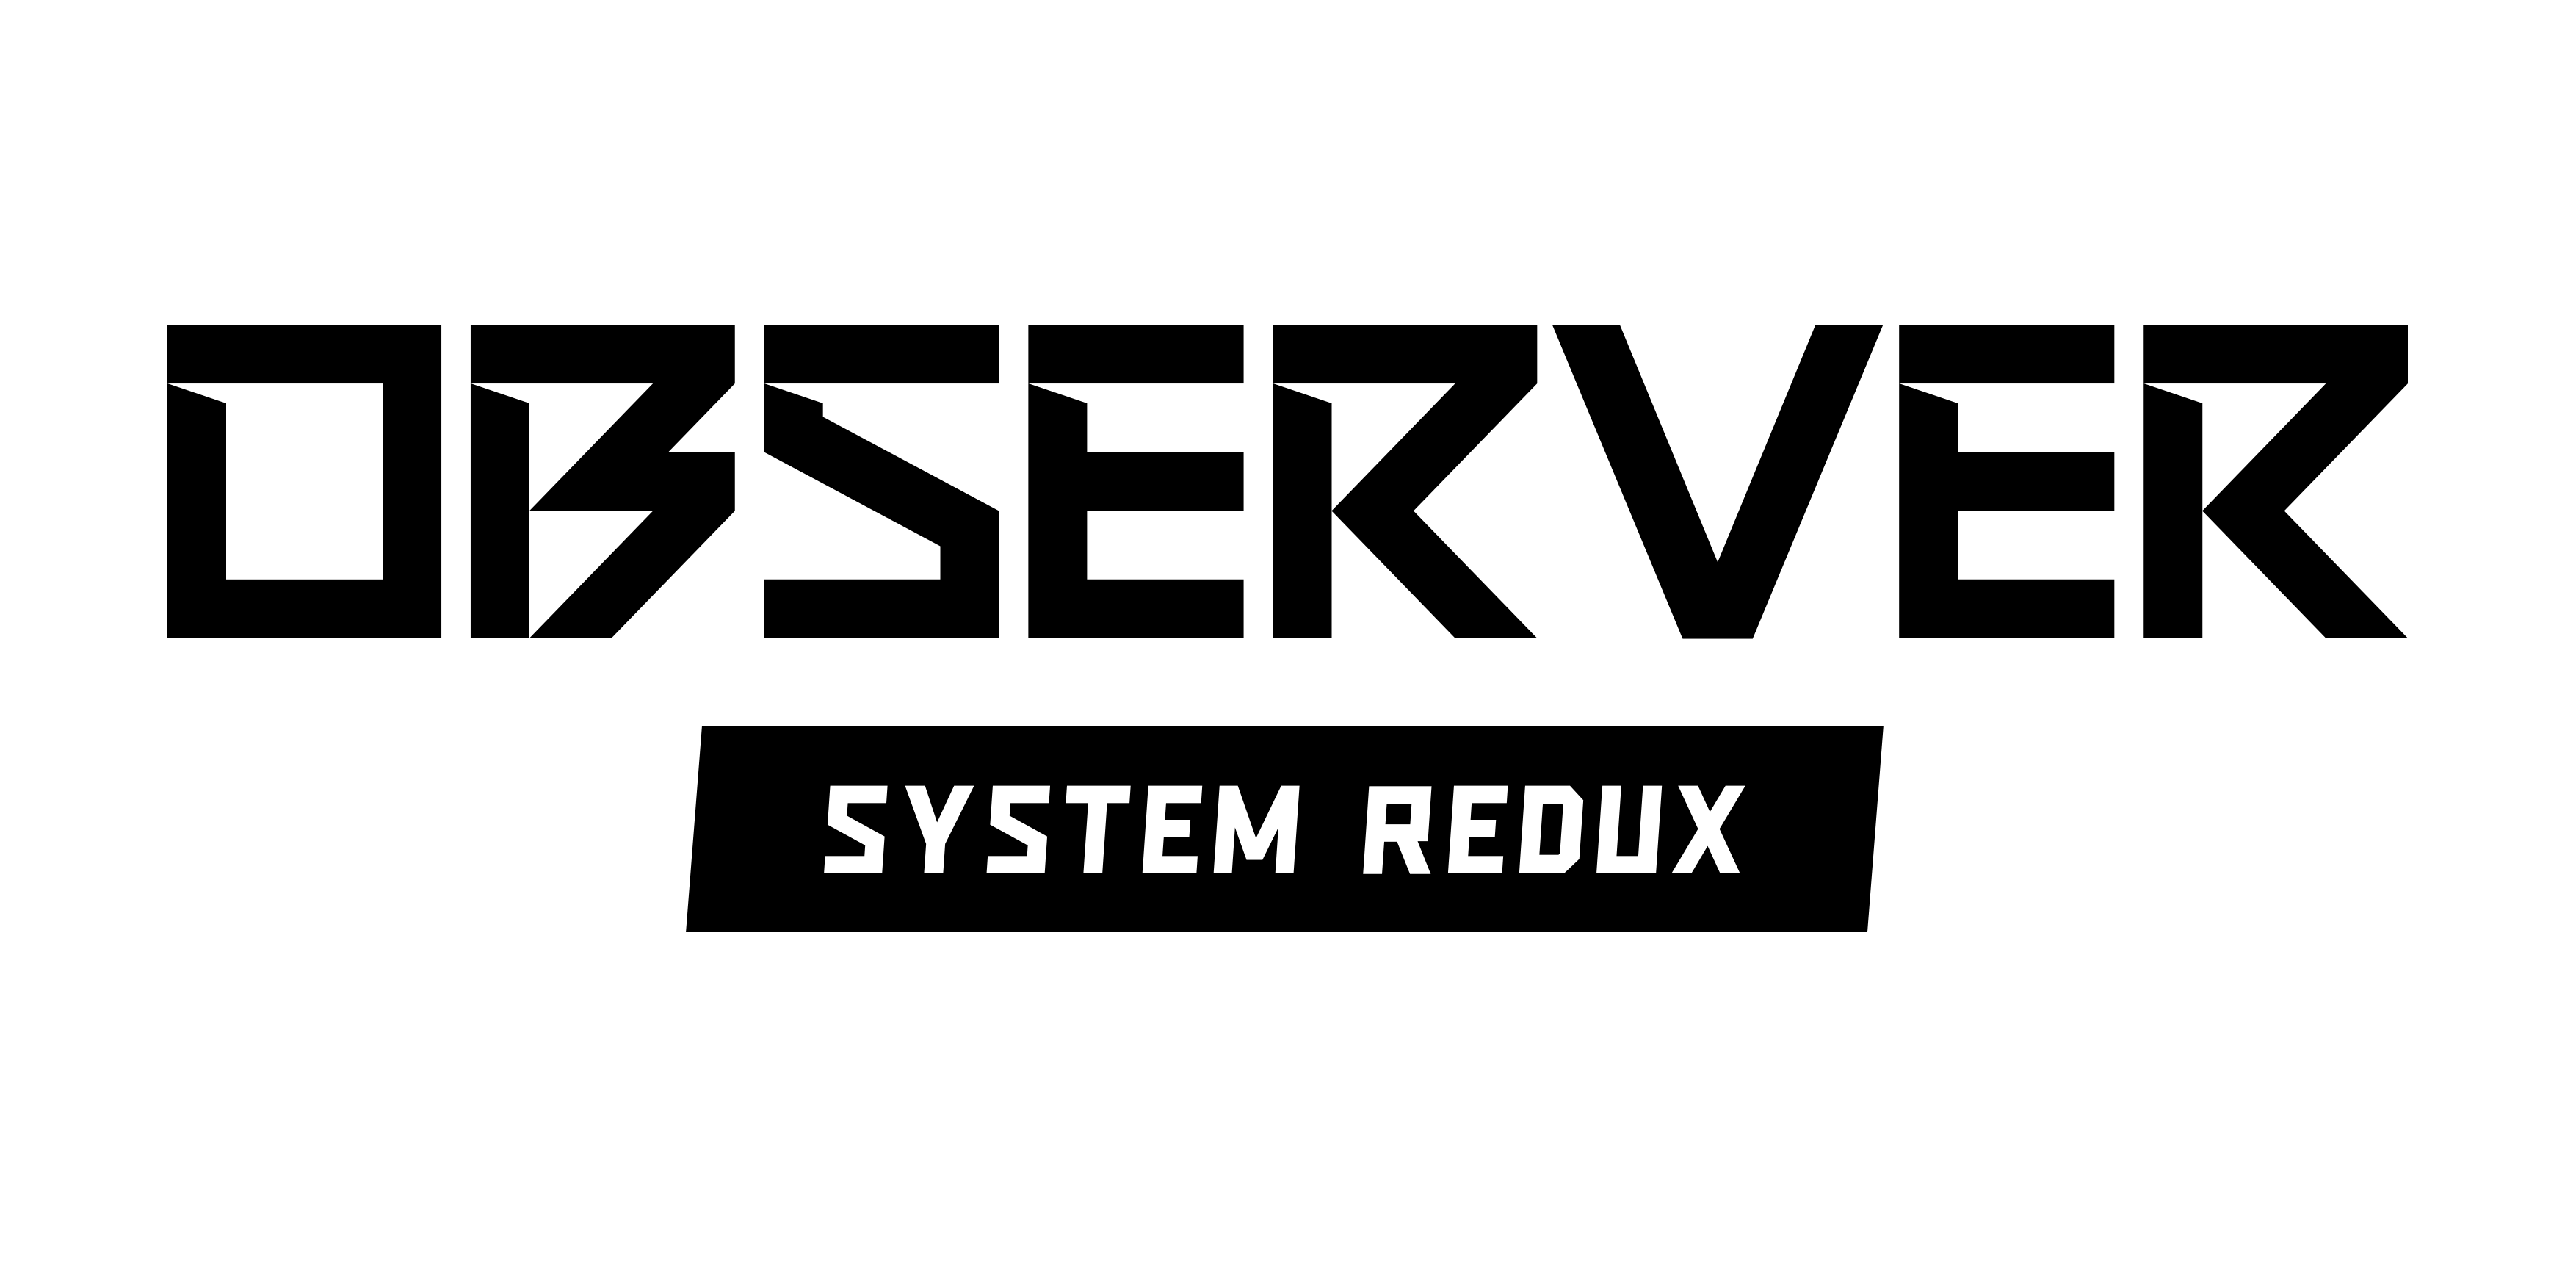 Observer-System-Redux_2020_04-16-20_002